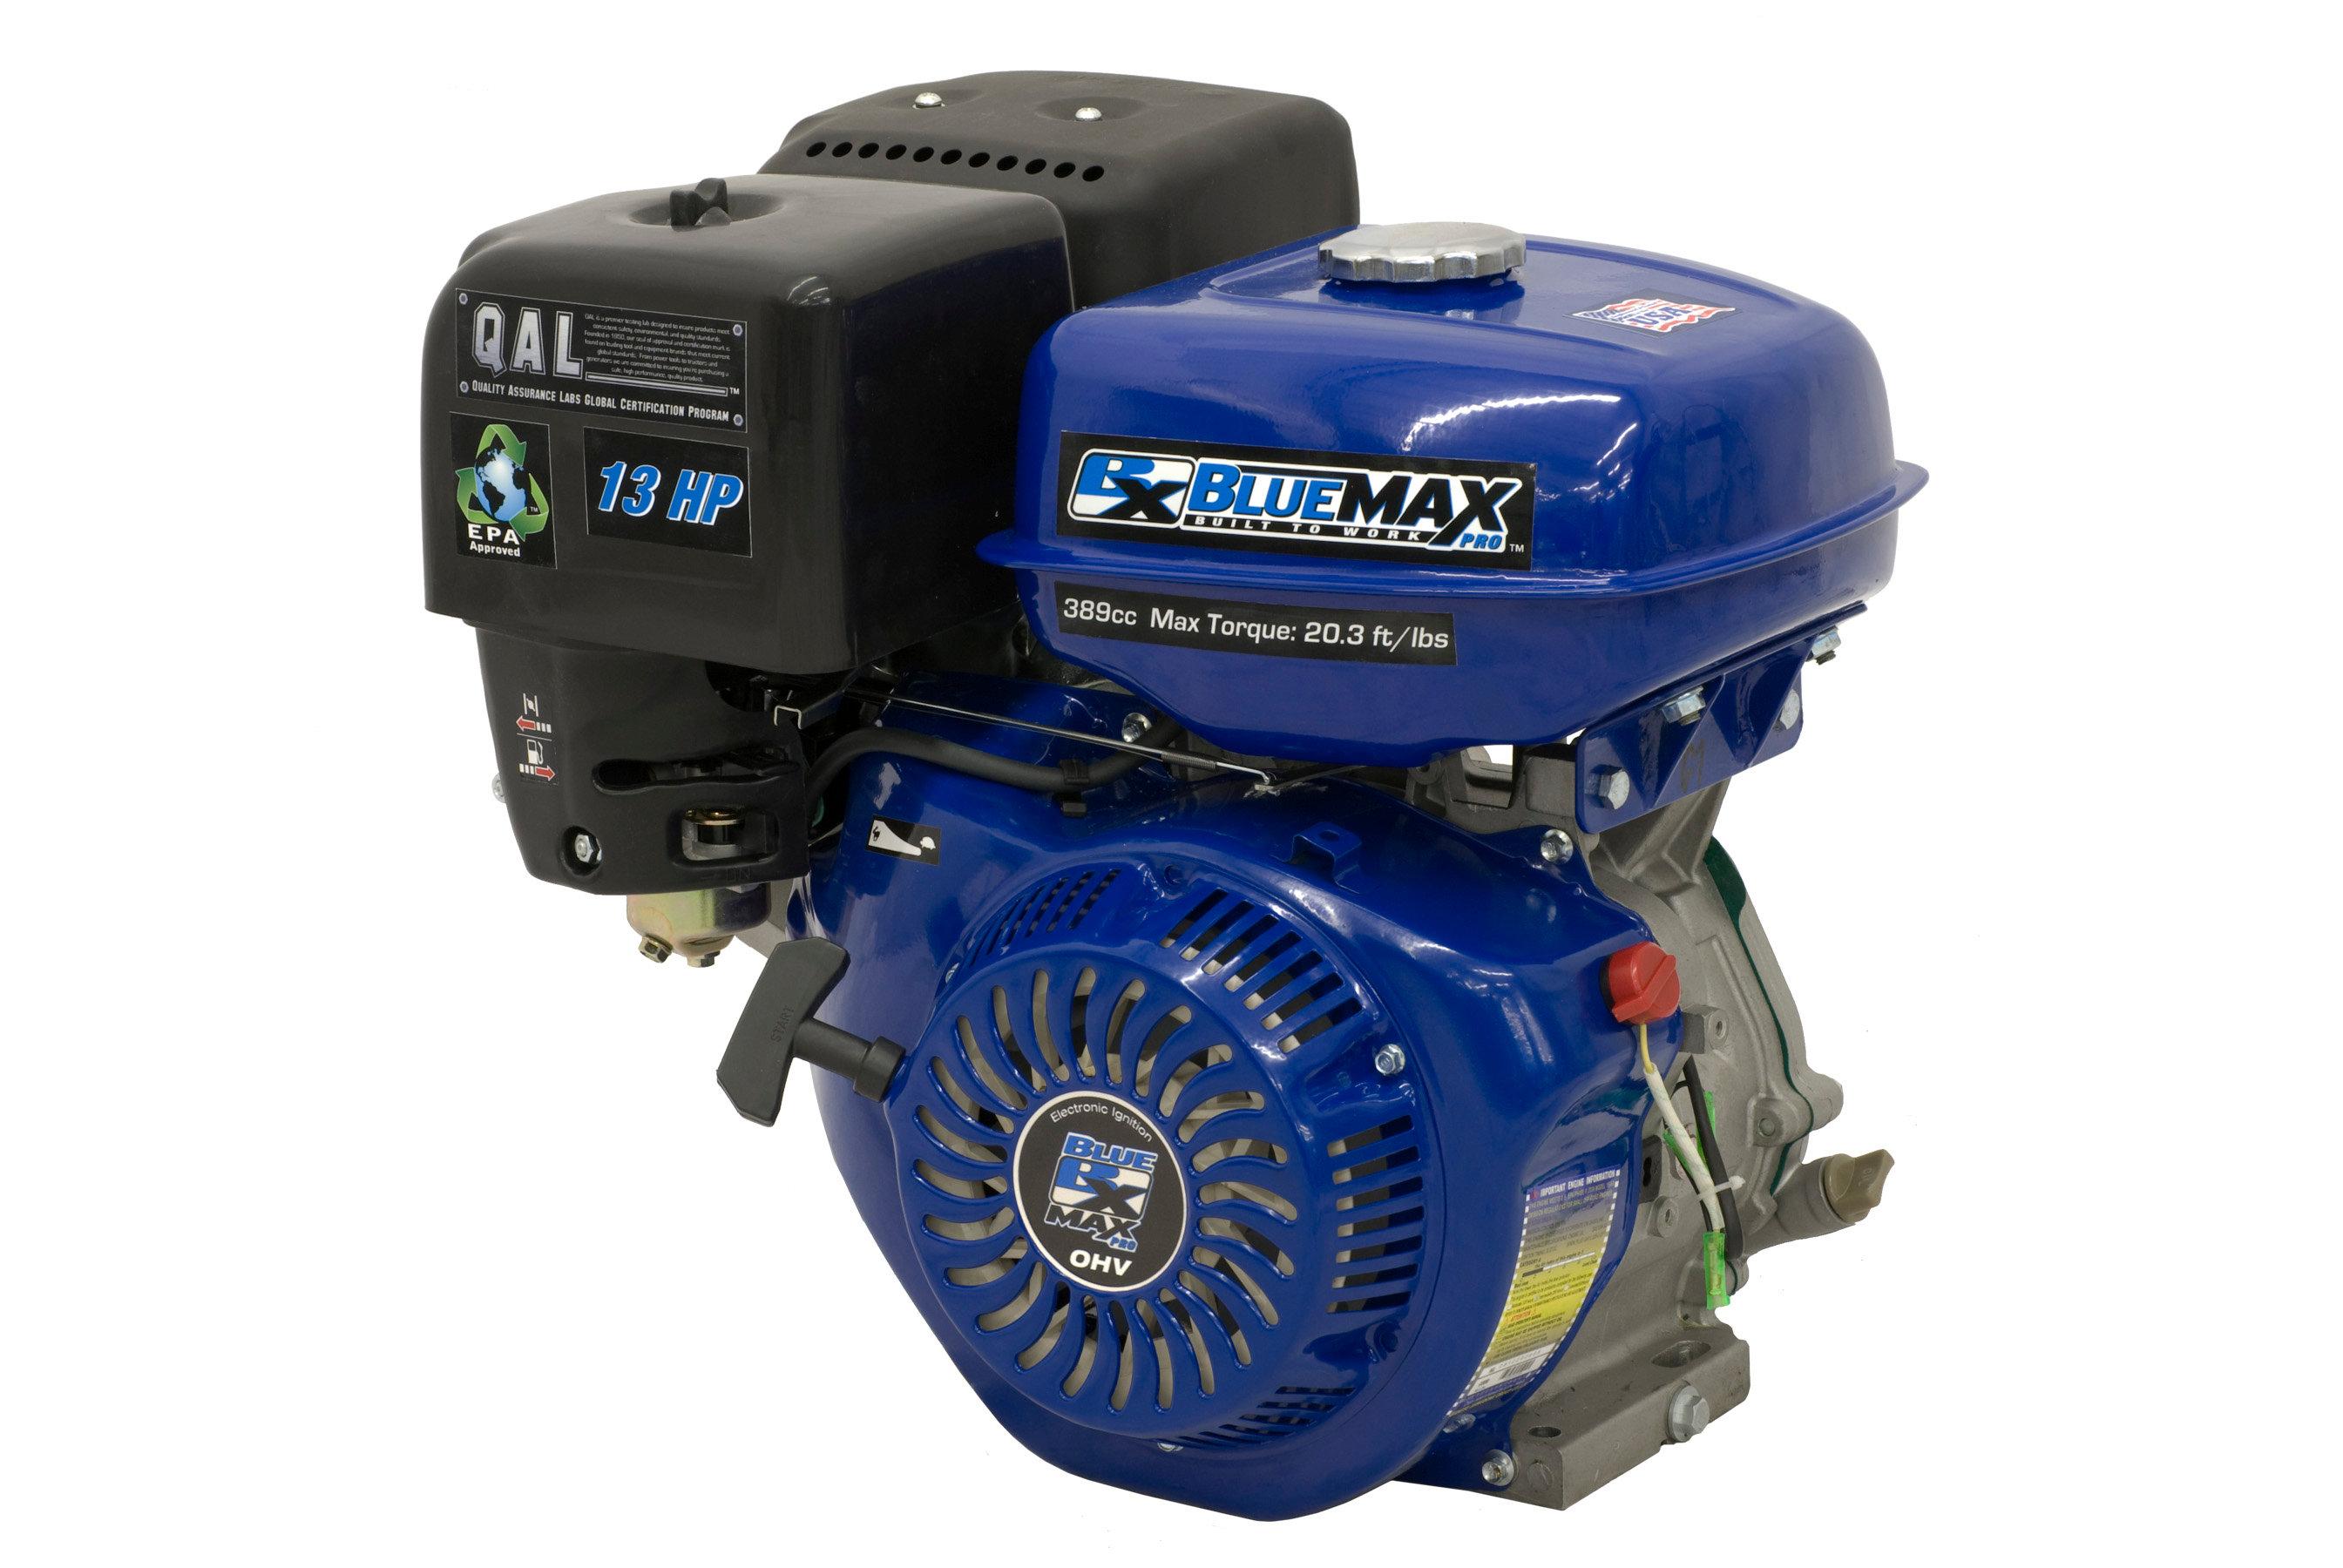 BlueMax 13 HP OHV Horizontal Shaft Gasoline Engine | nati